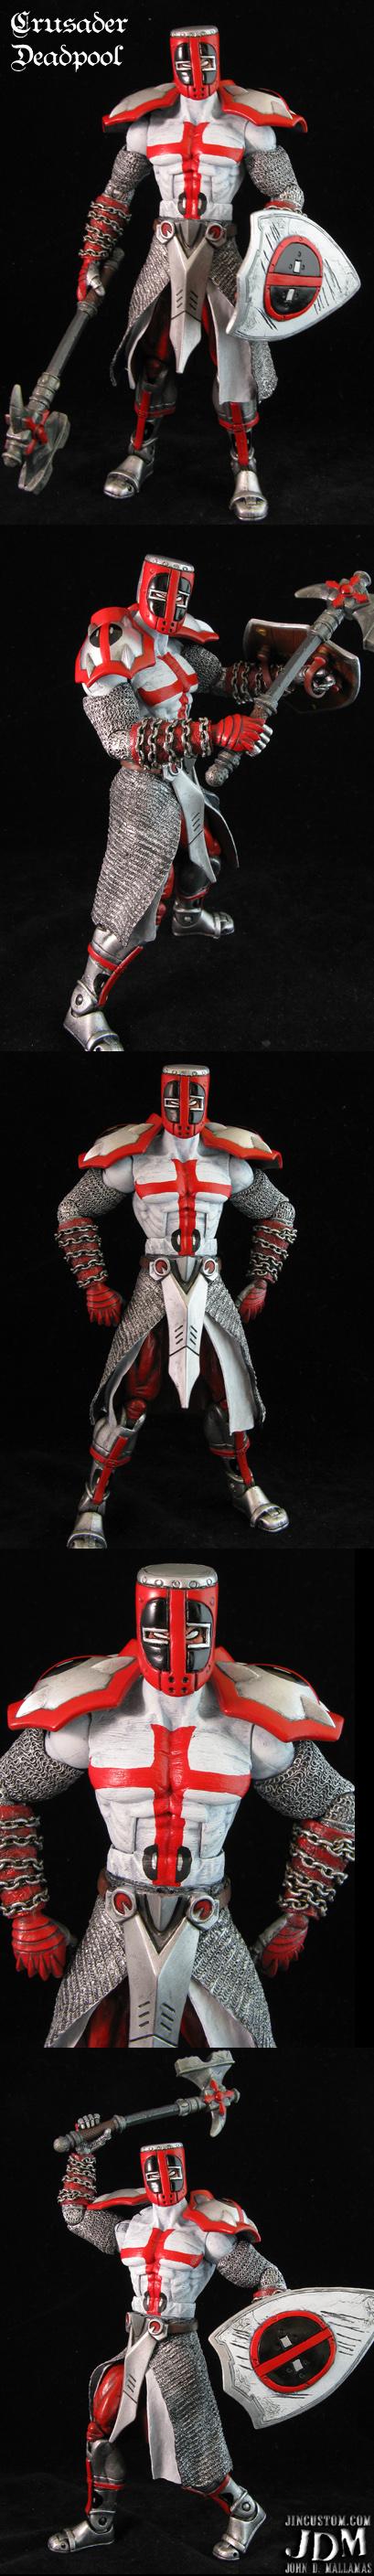 Crusader Deadpool